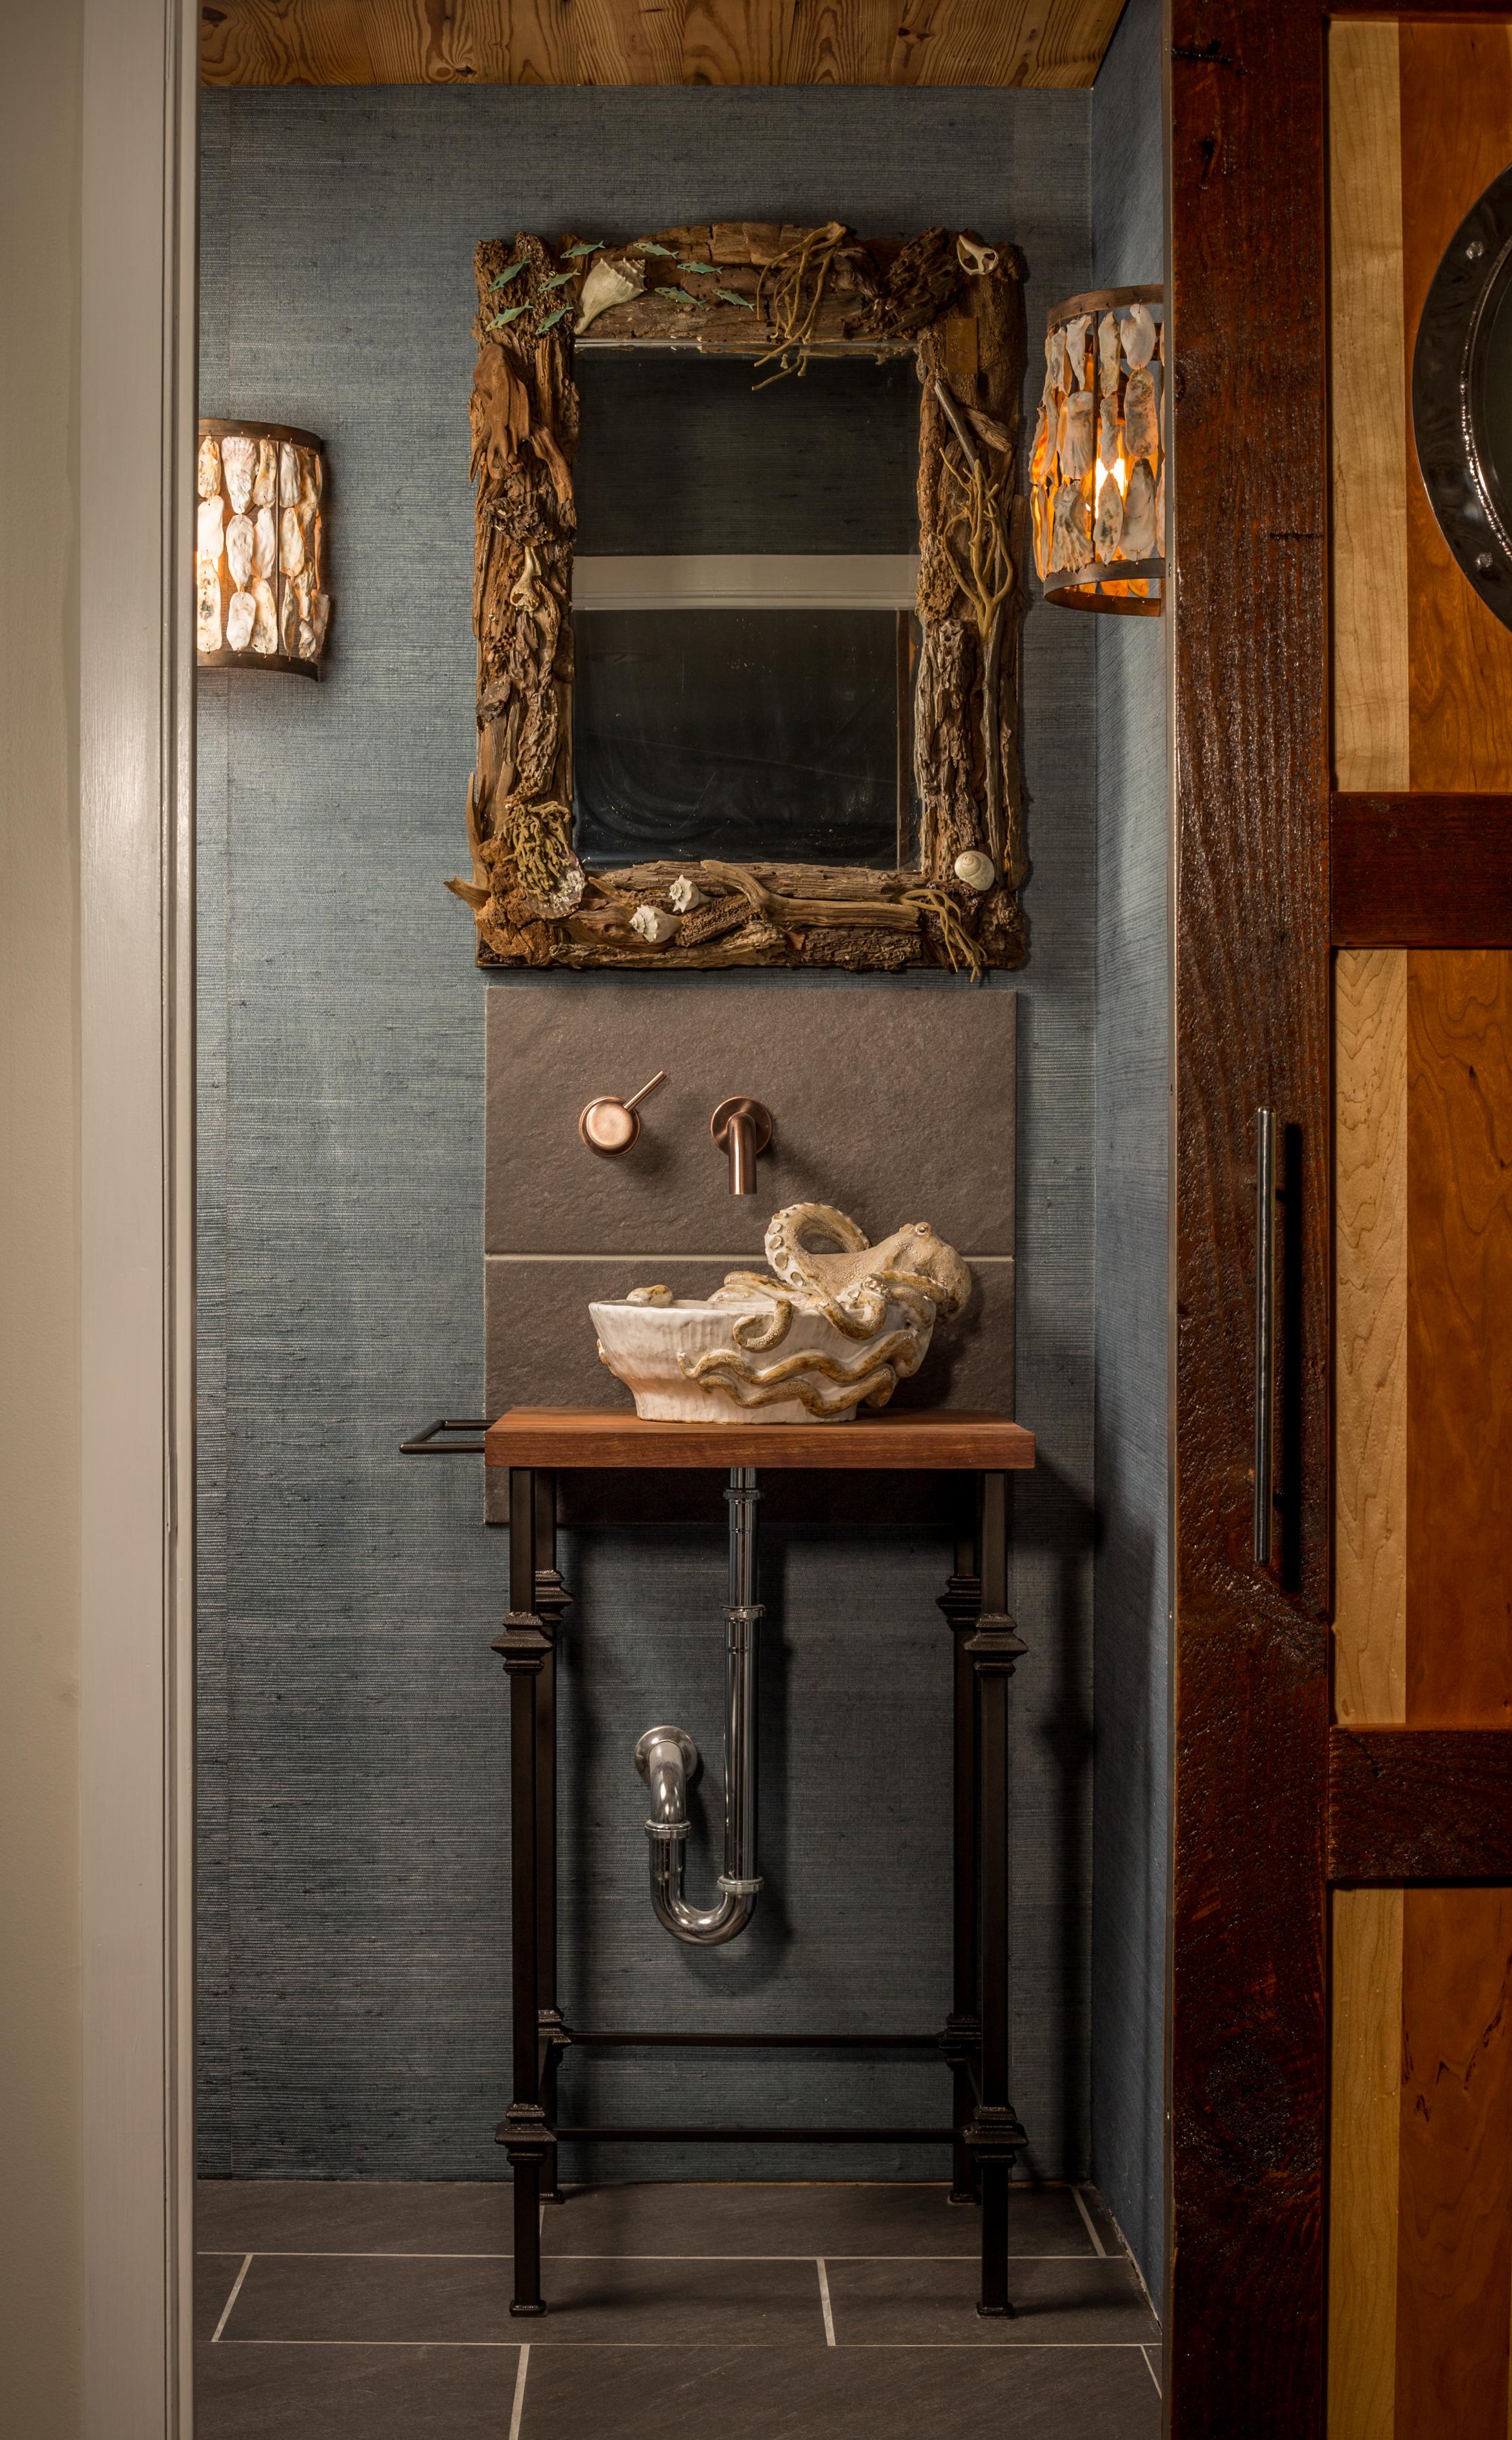 Perfect Bathroom Vanity Driftwood Mirror & Sconces - R Mended Metals, LLC YV32